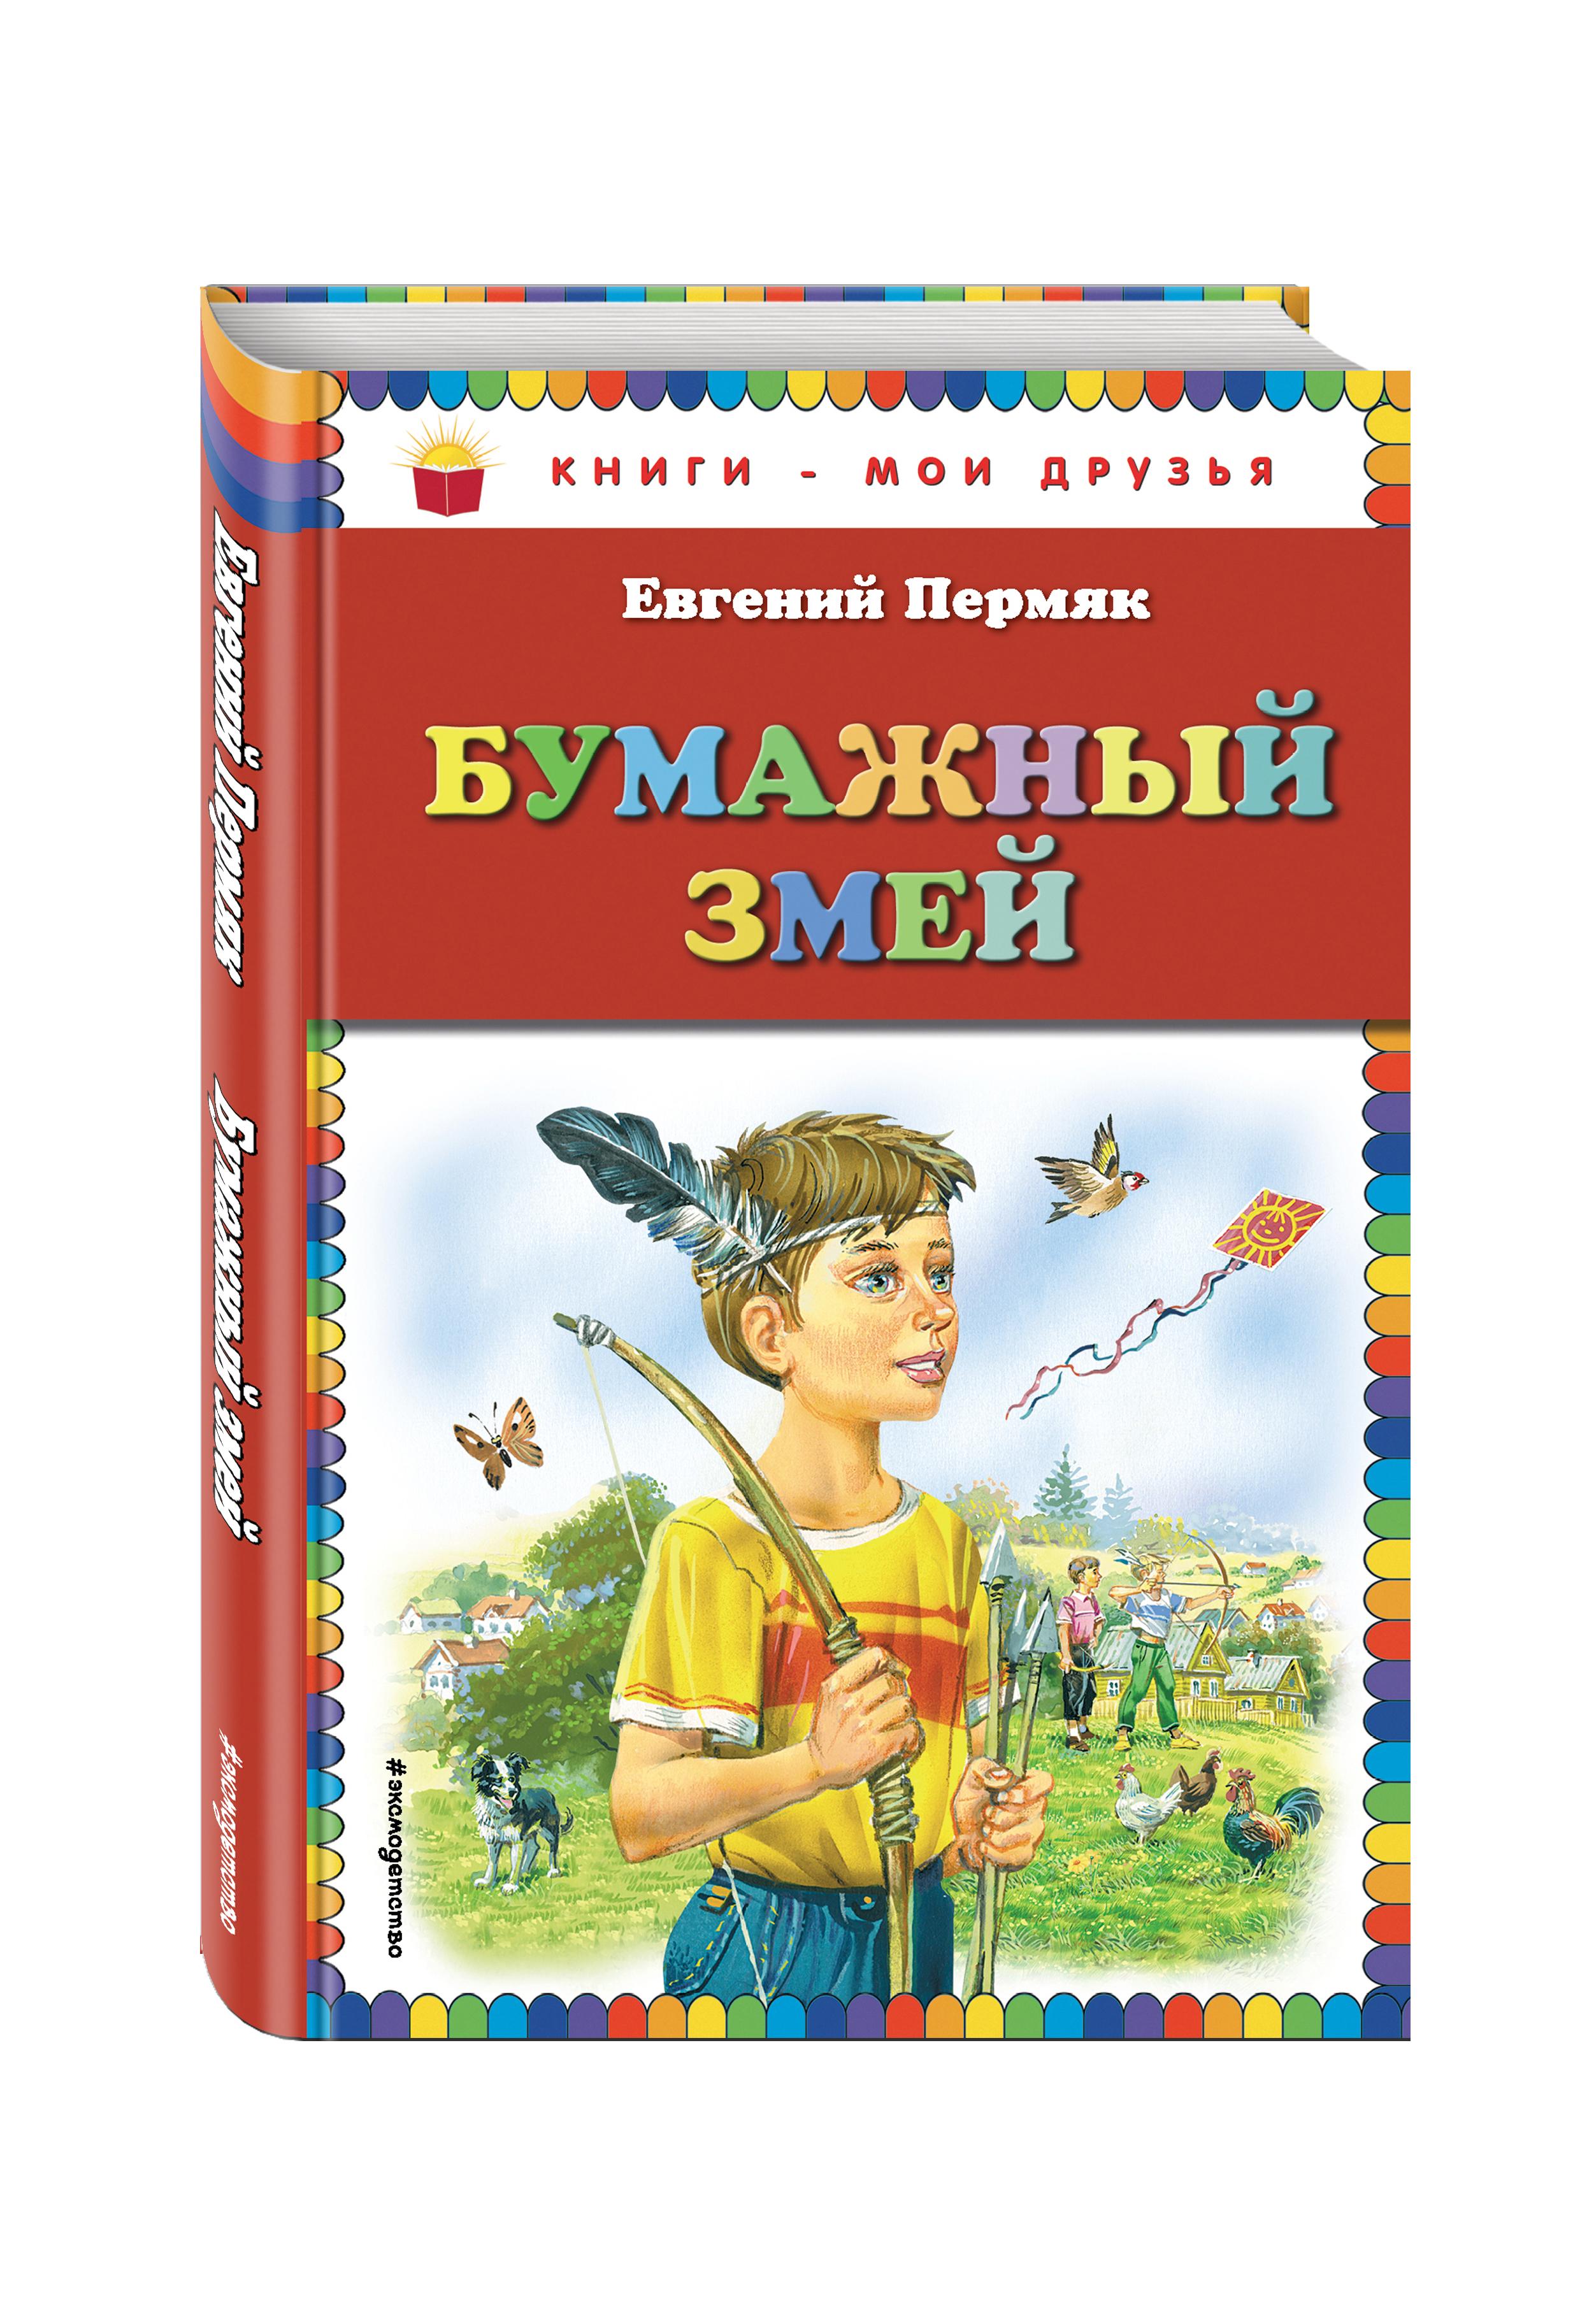 Евгений Пермяк Бумажный змей евгений пермяк далматова фартуната